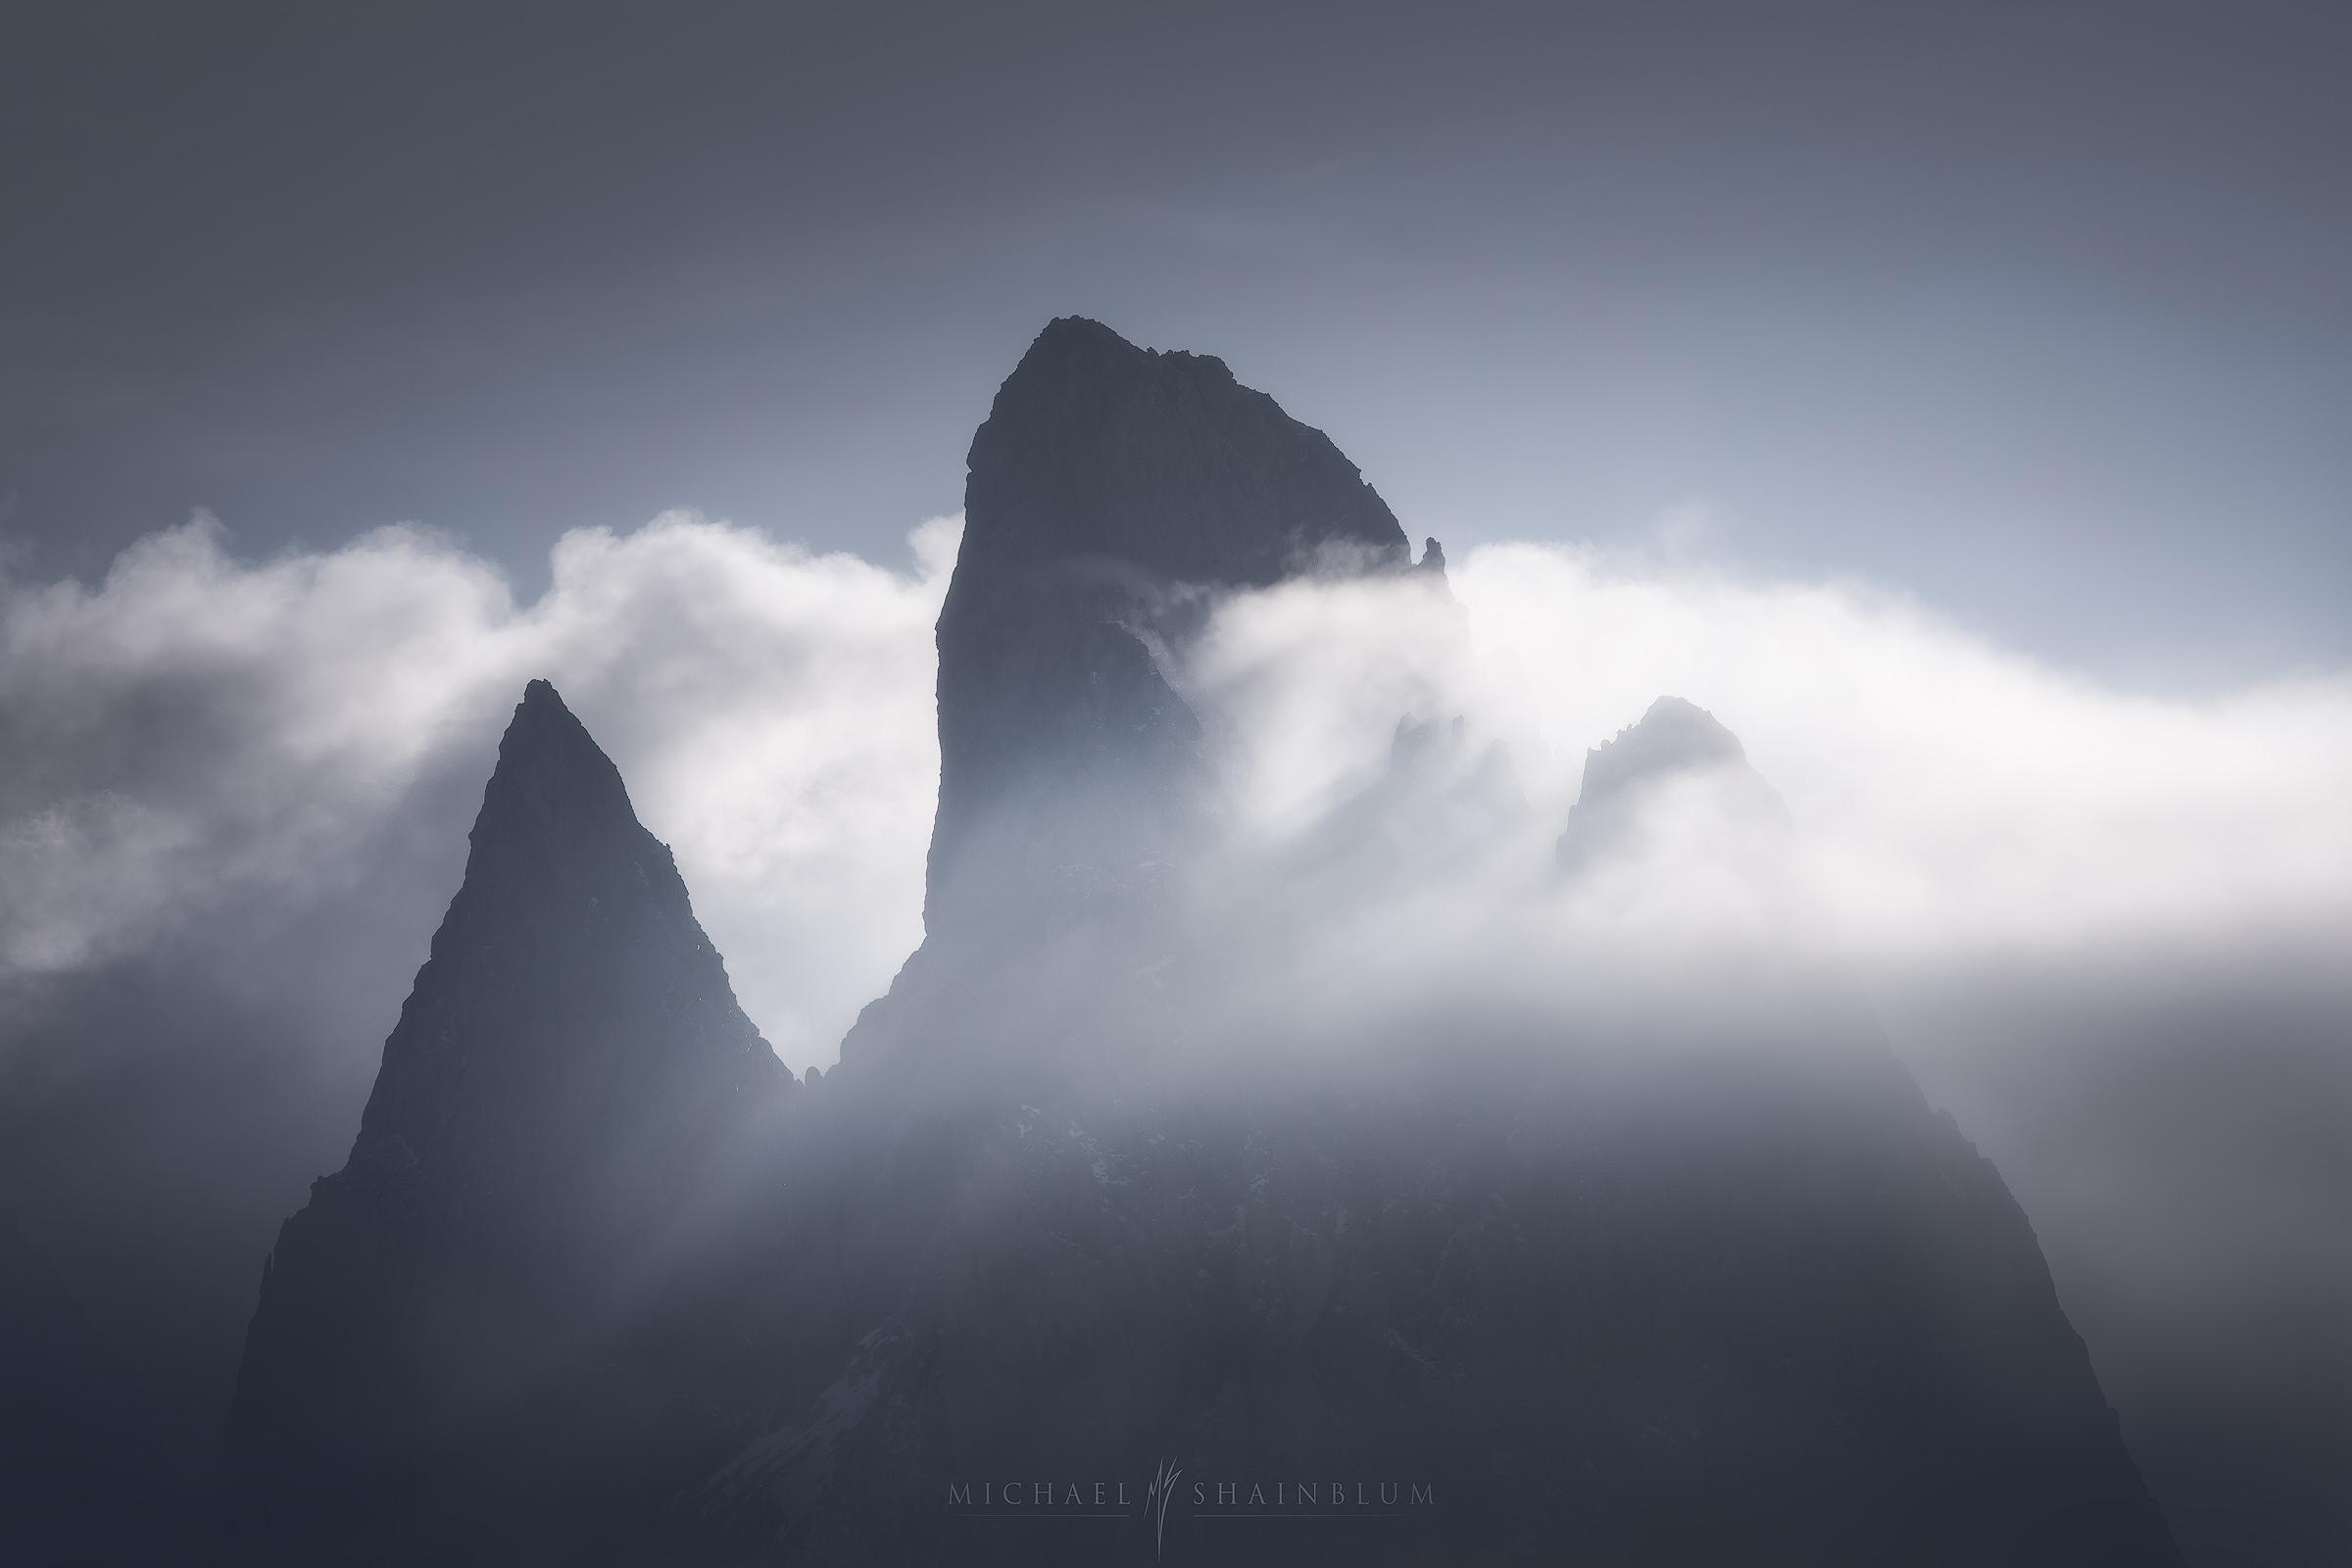 dolomites landscape photography